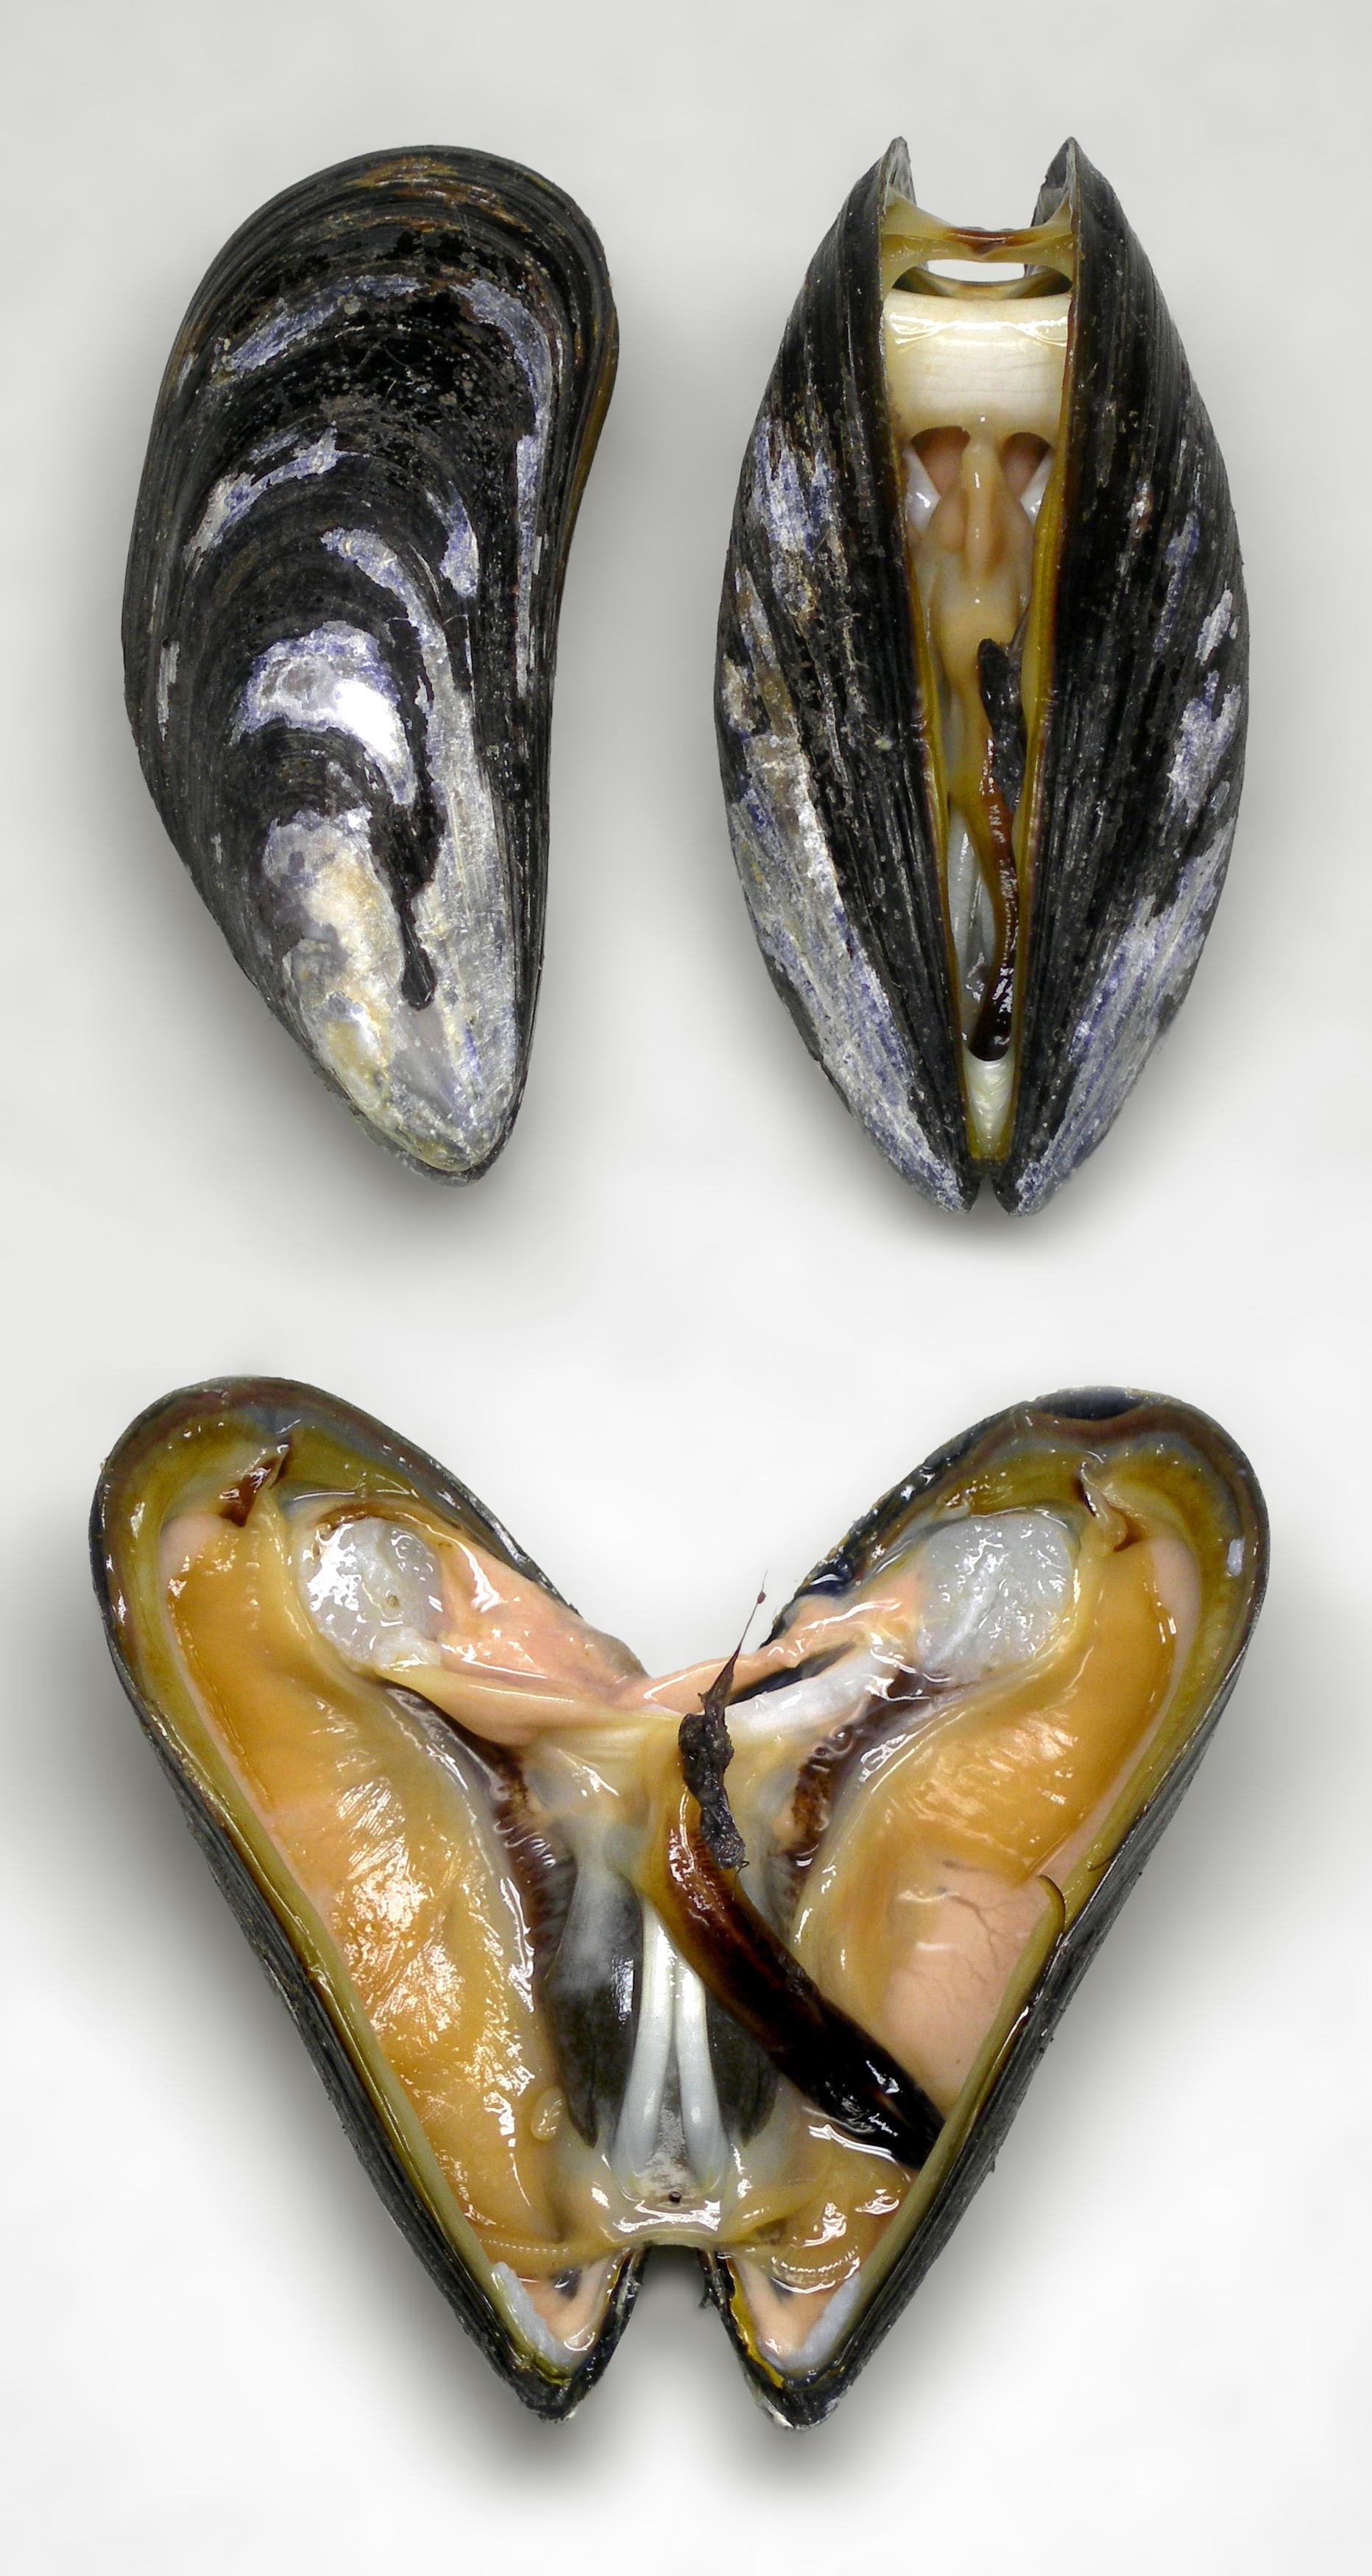 Marine blue mussel,  Mytilus edulis  (wikipedia image)